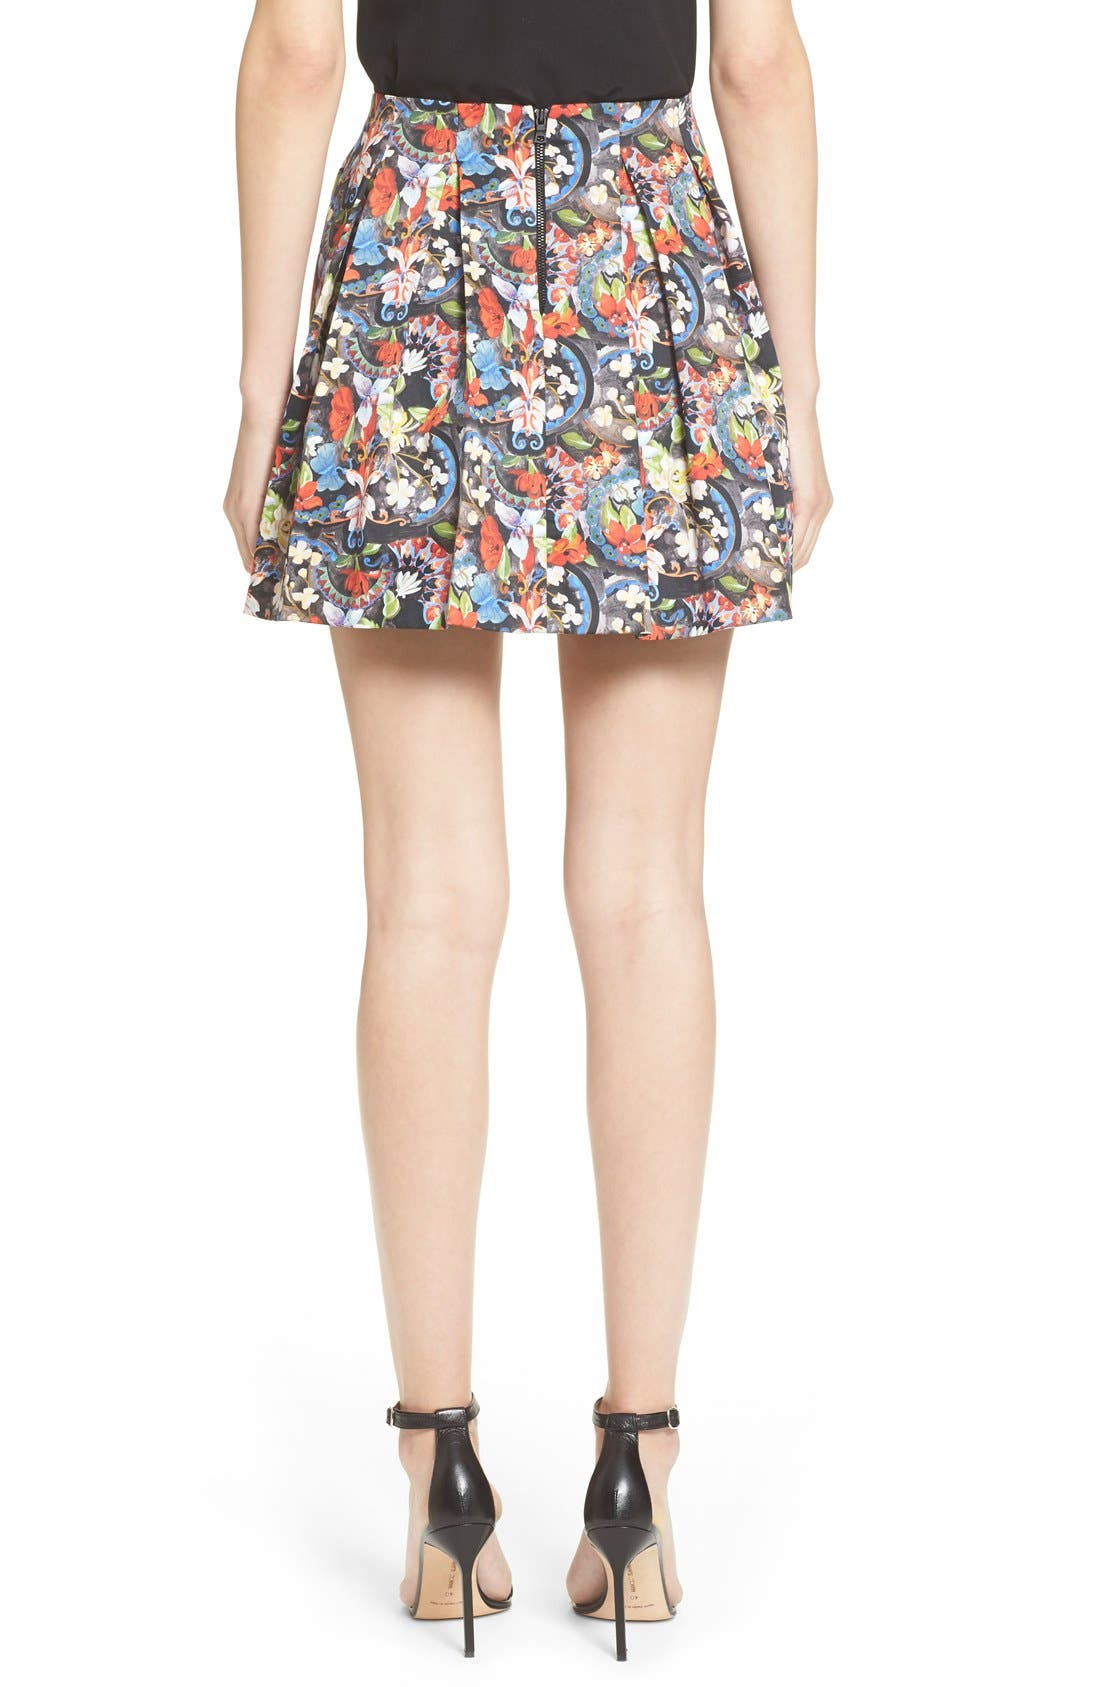 ALICE + OLIVIA, 'Parson' Floral Print Pleated Miniskirt, Alternate thumbnail 3, color, 605